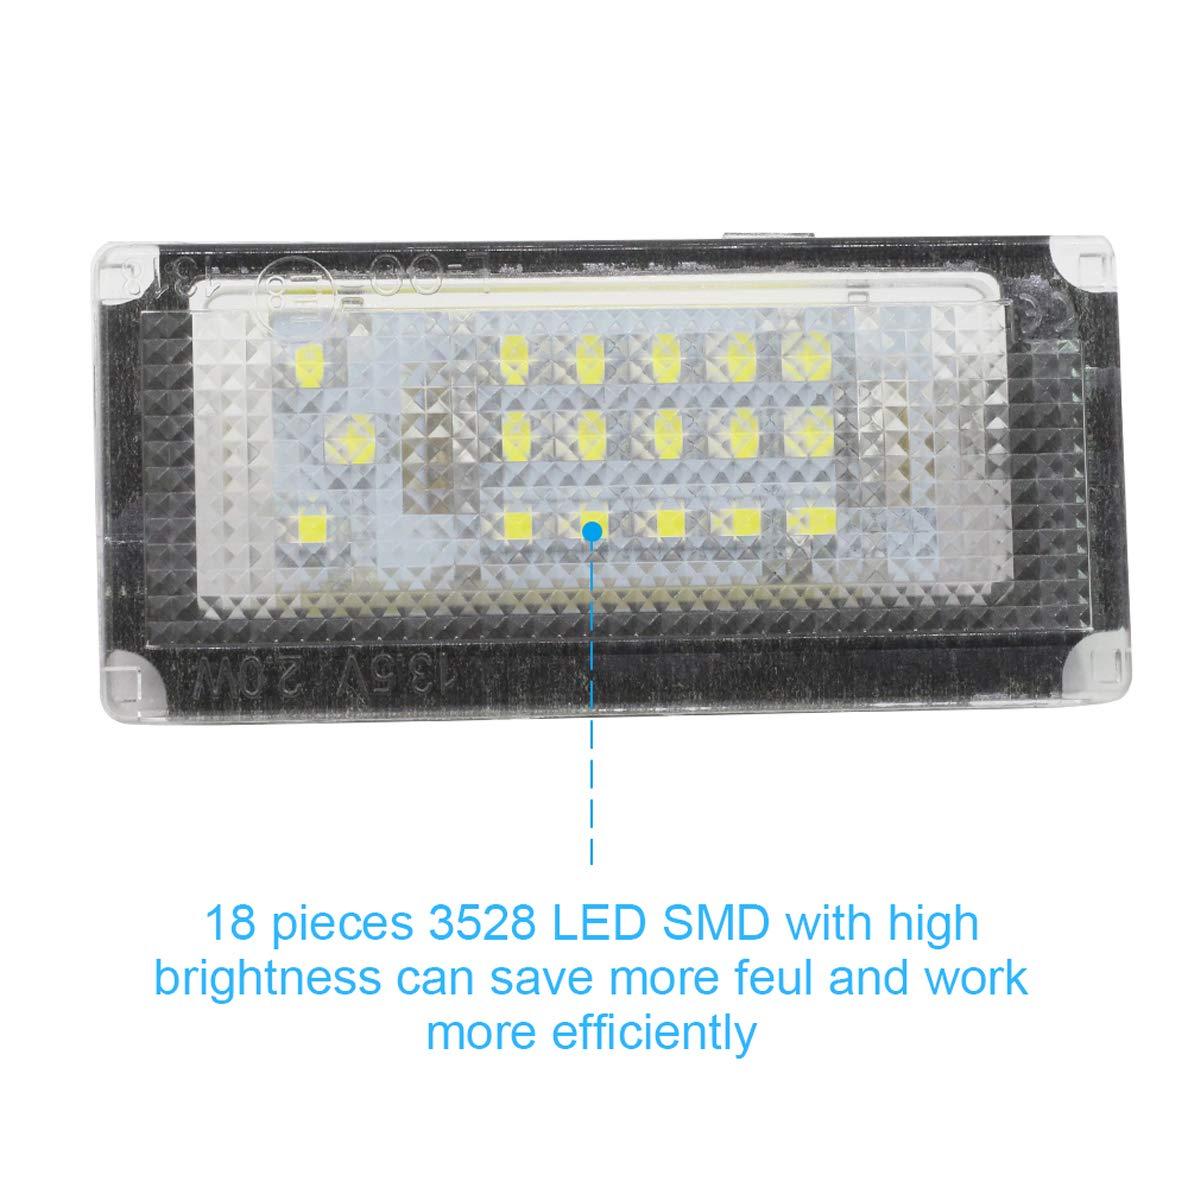 ZHUHAI HONGKANG DONGMAO TRADING CO LTD La Plaque dimmatriculation de la Voiture LED Allume Le Blanc 12V pour la Mini Cooper S R50 R52 R53 B//MW